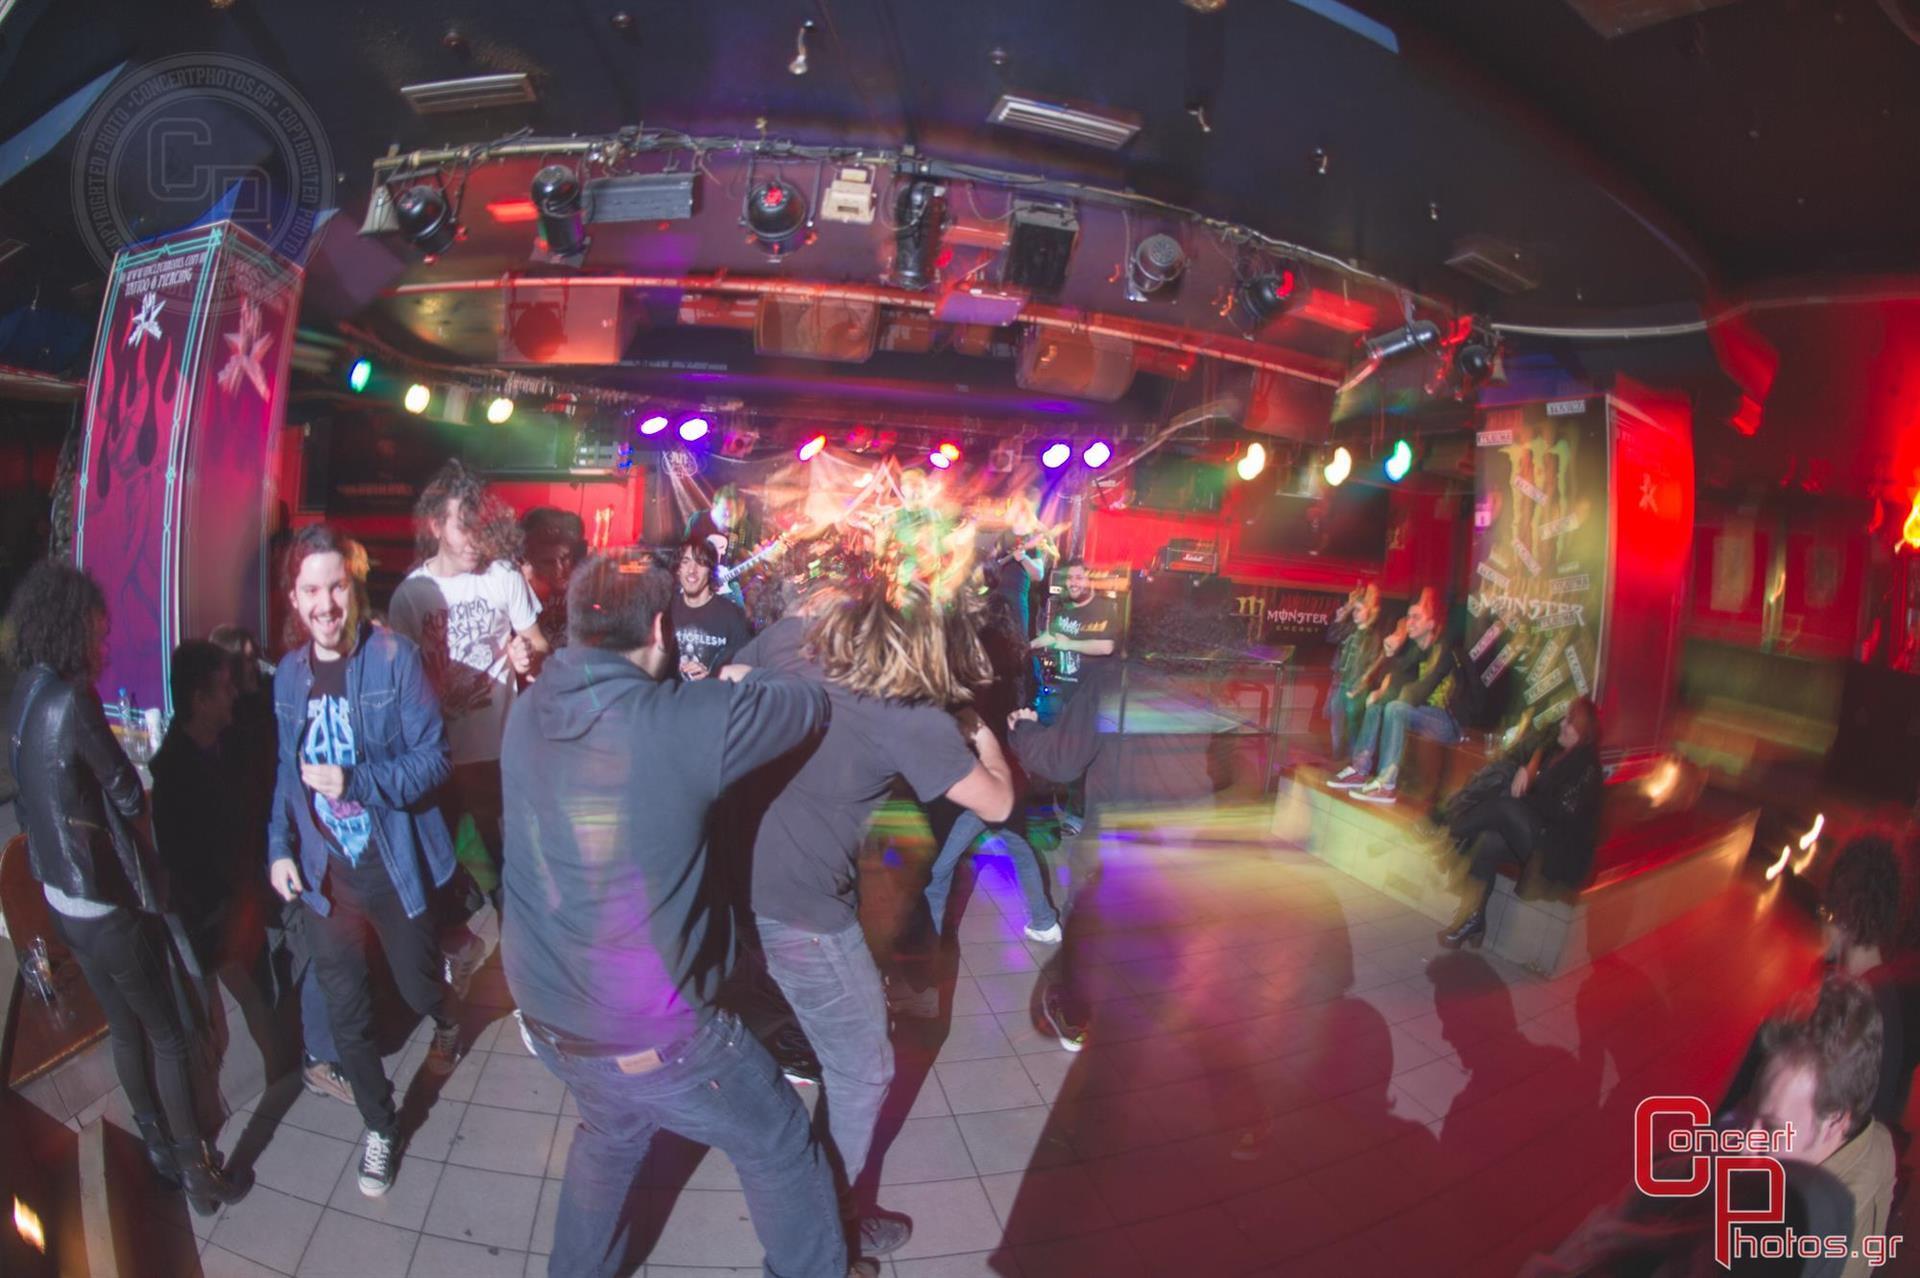 Battle Of The Bands Athens - Leg 3- photographer:  - ConcertPhotos - 20150104_2256_04